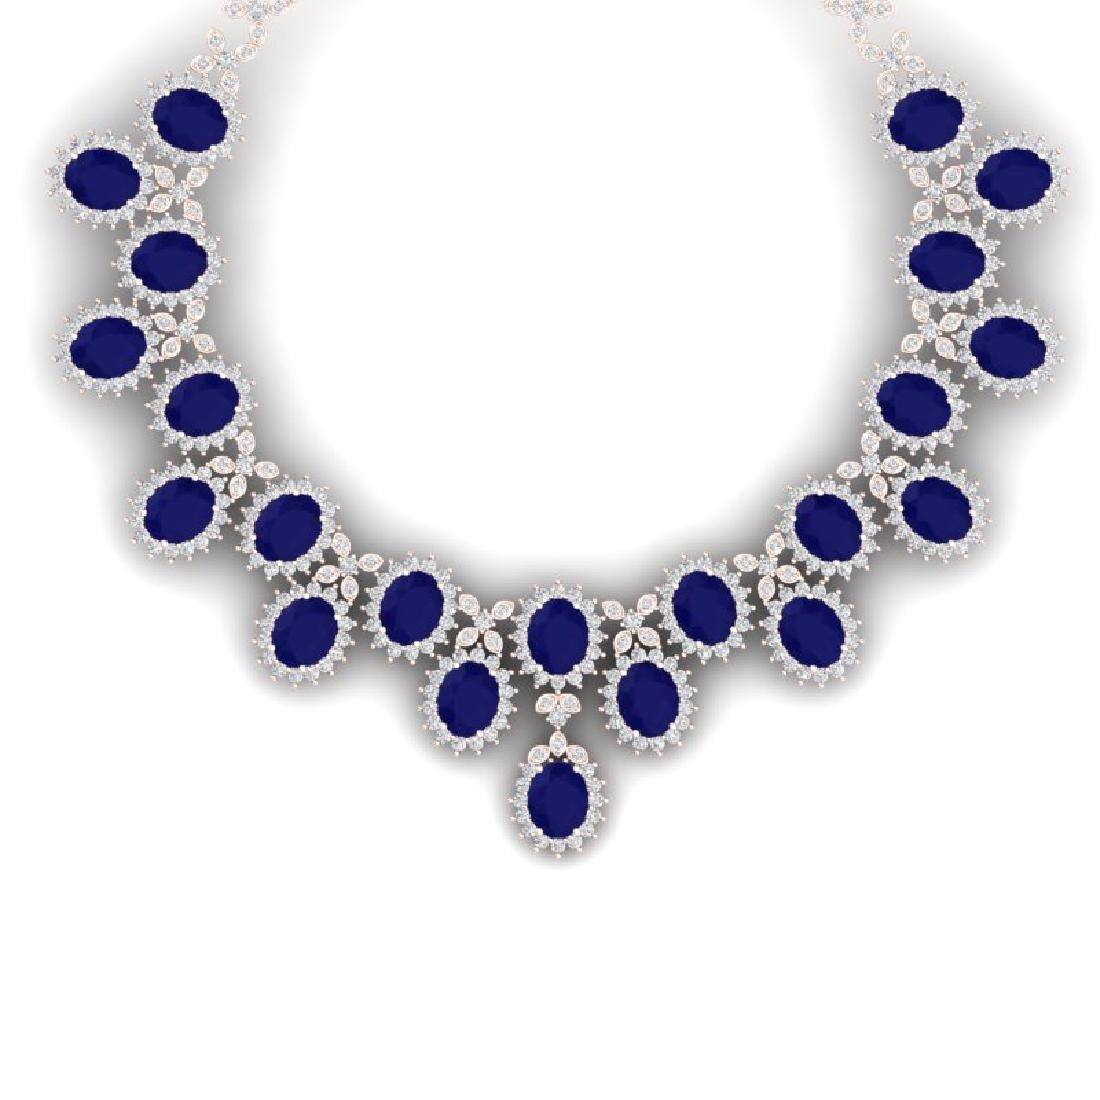 81 CTW Royalty Sapphire & VS Diamond Necklace 18K Rose